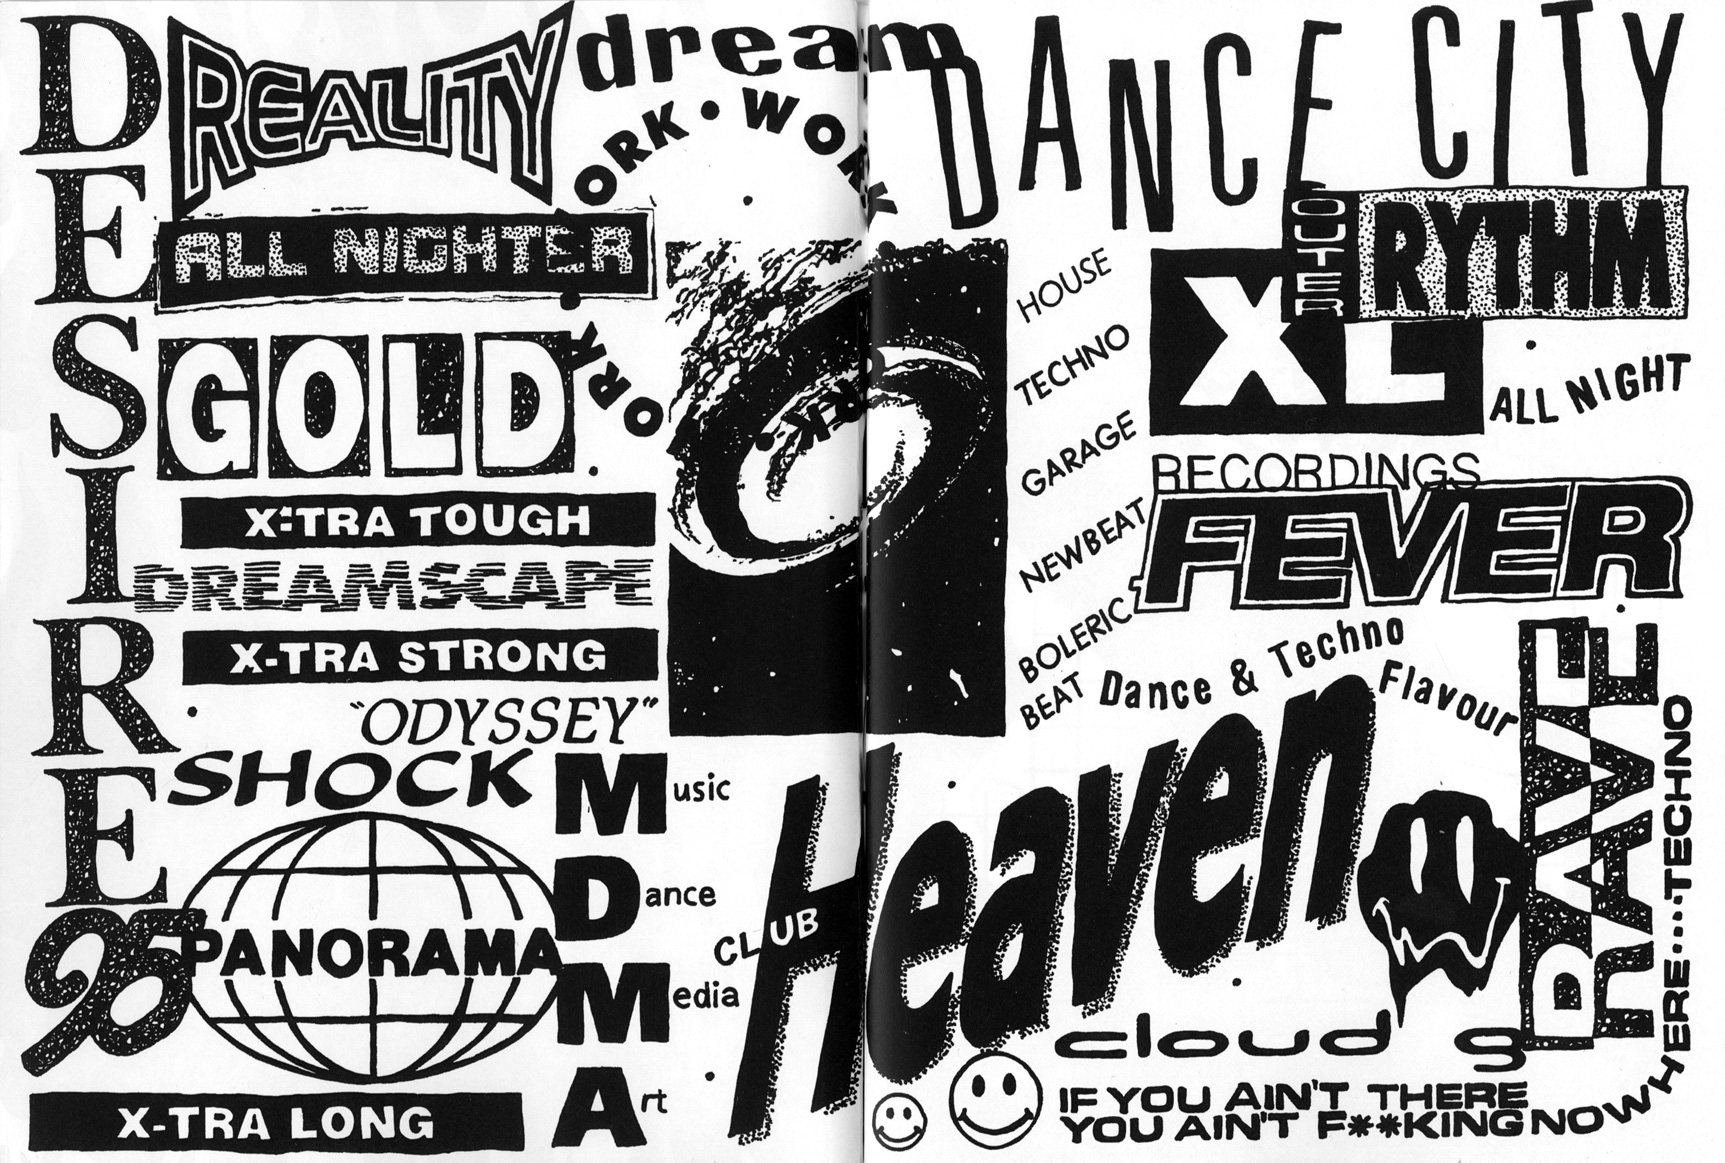 club_nightclub_spread_scan_2.jpg